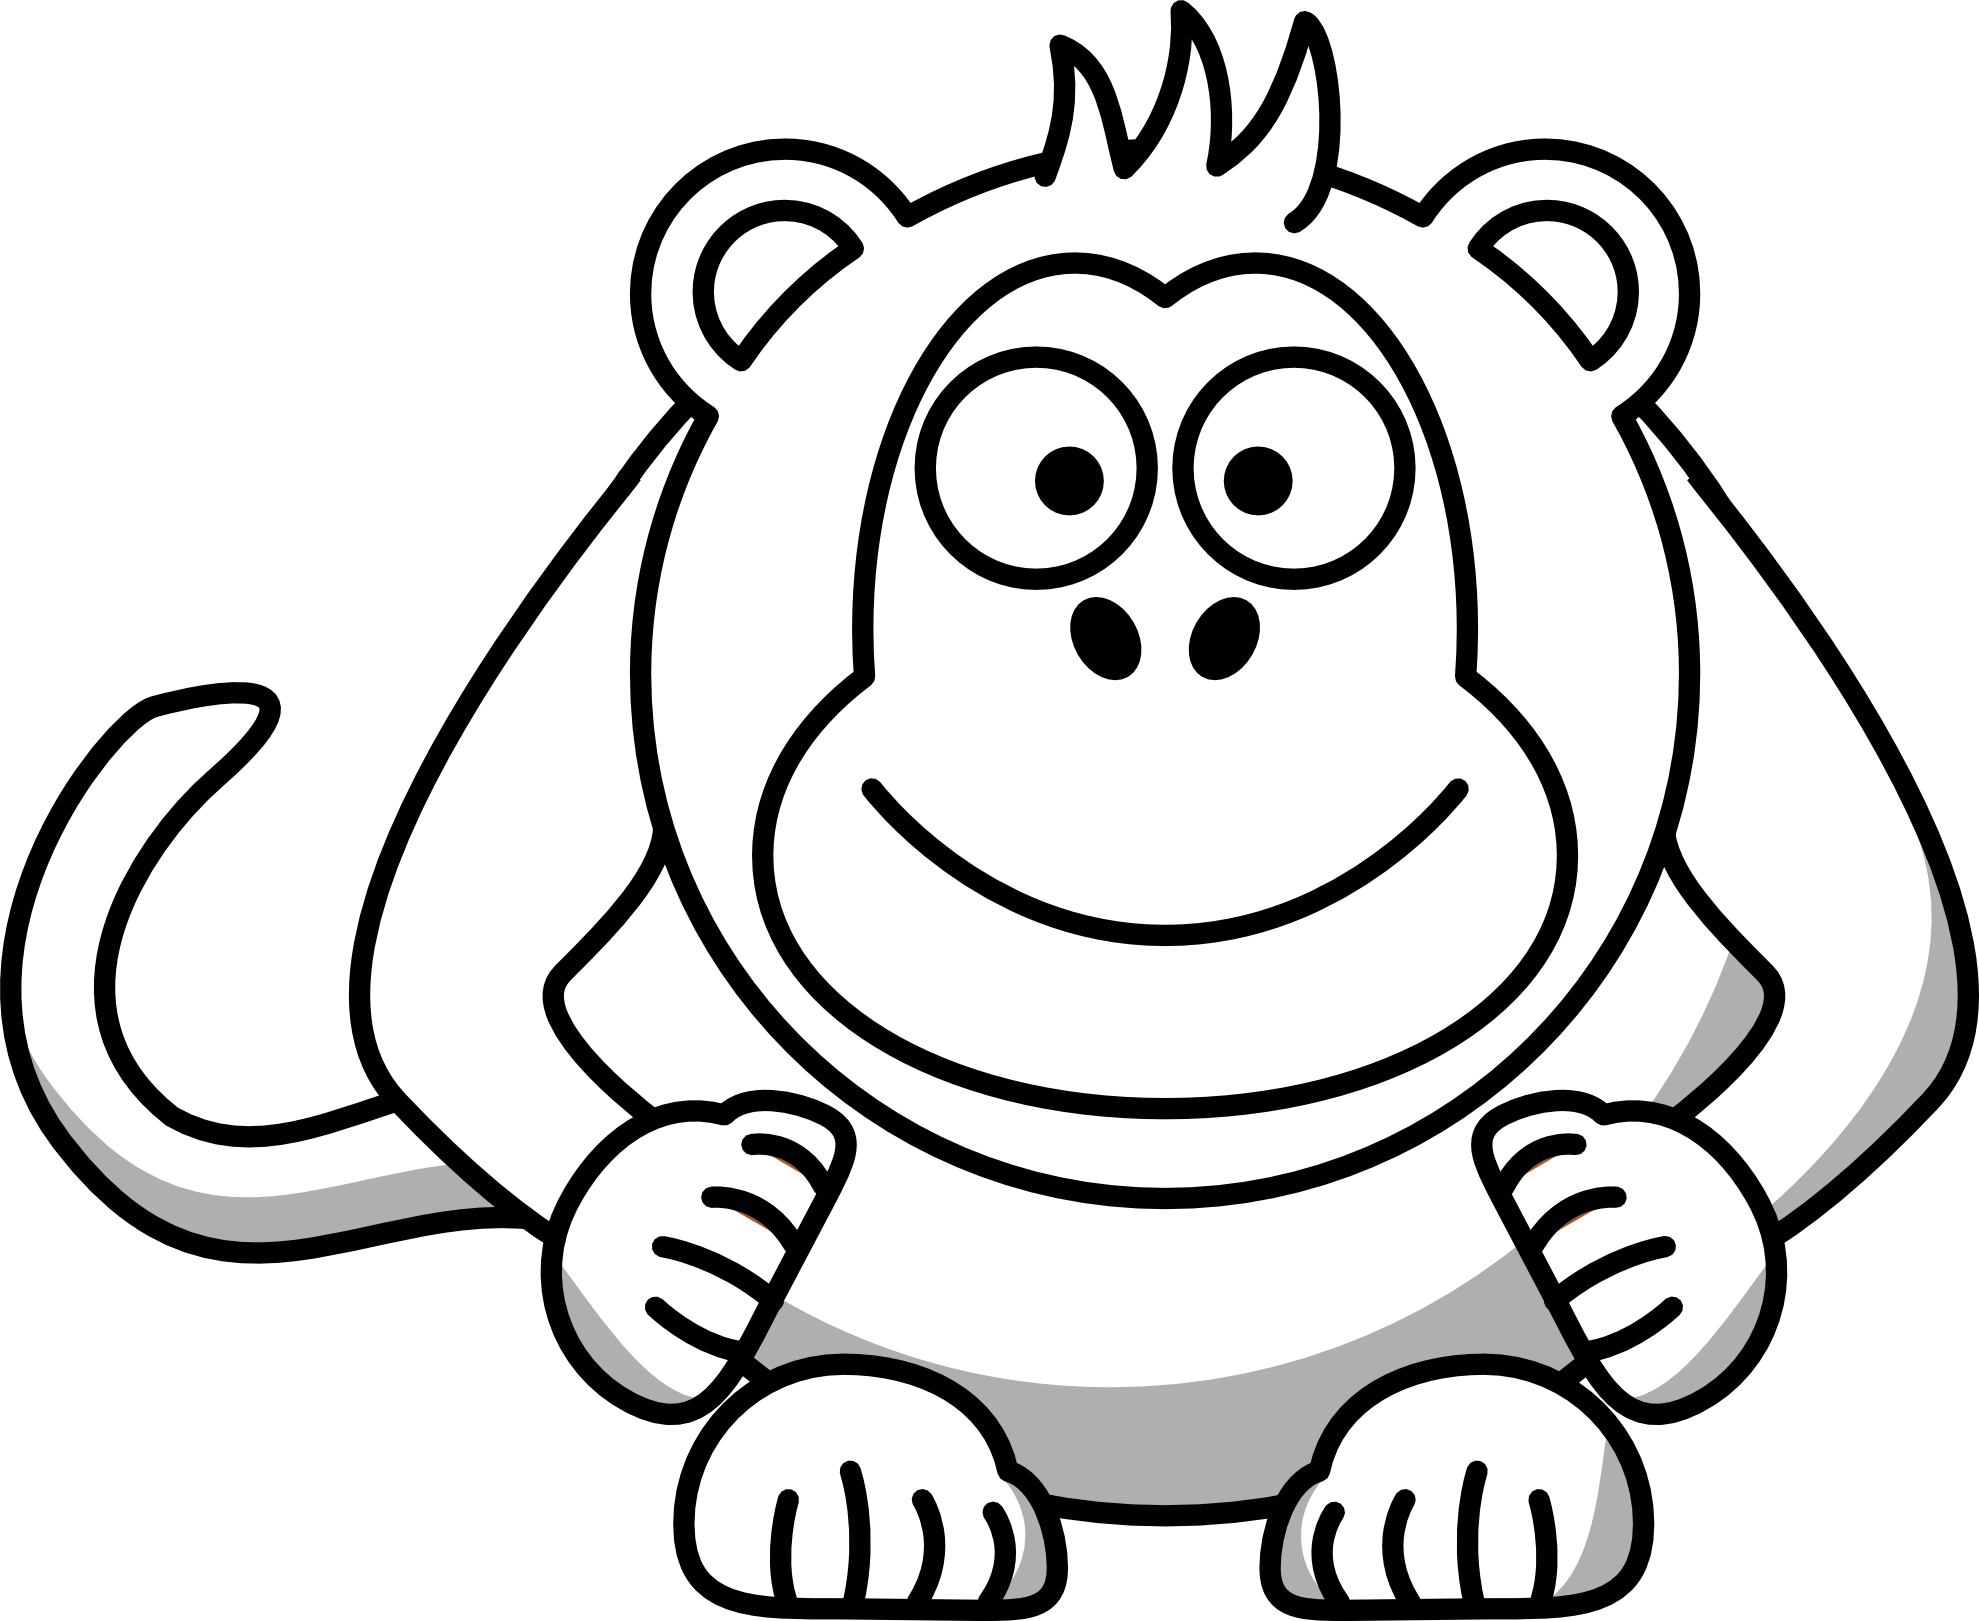 Monkey hanging from tree clipart banner royalty free stock Free Cartoon Pics Of Monkeys, Download Free Clip Art, Free Clip Art ... banner royalty free stock